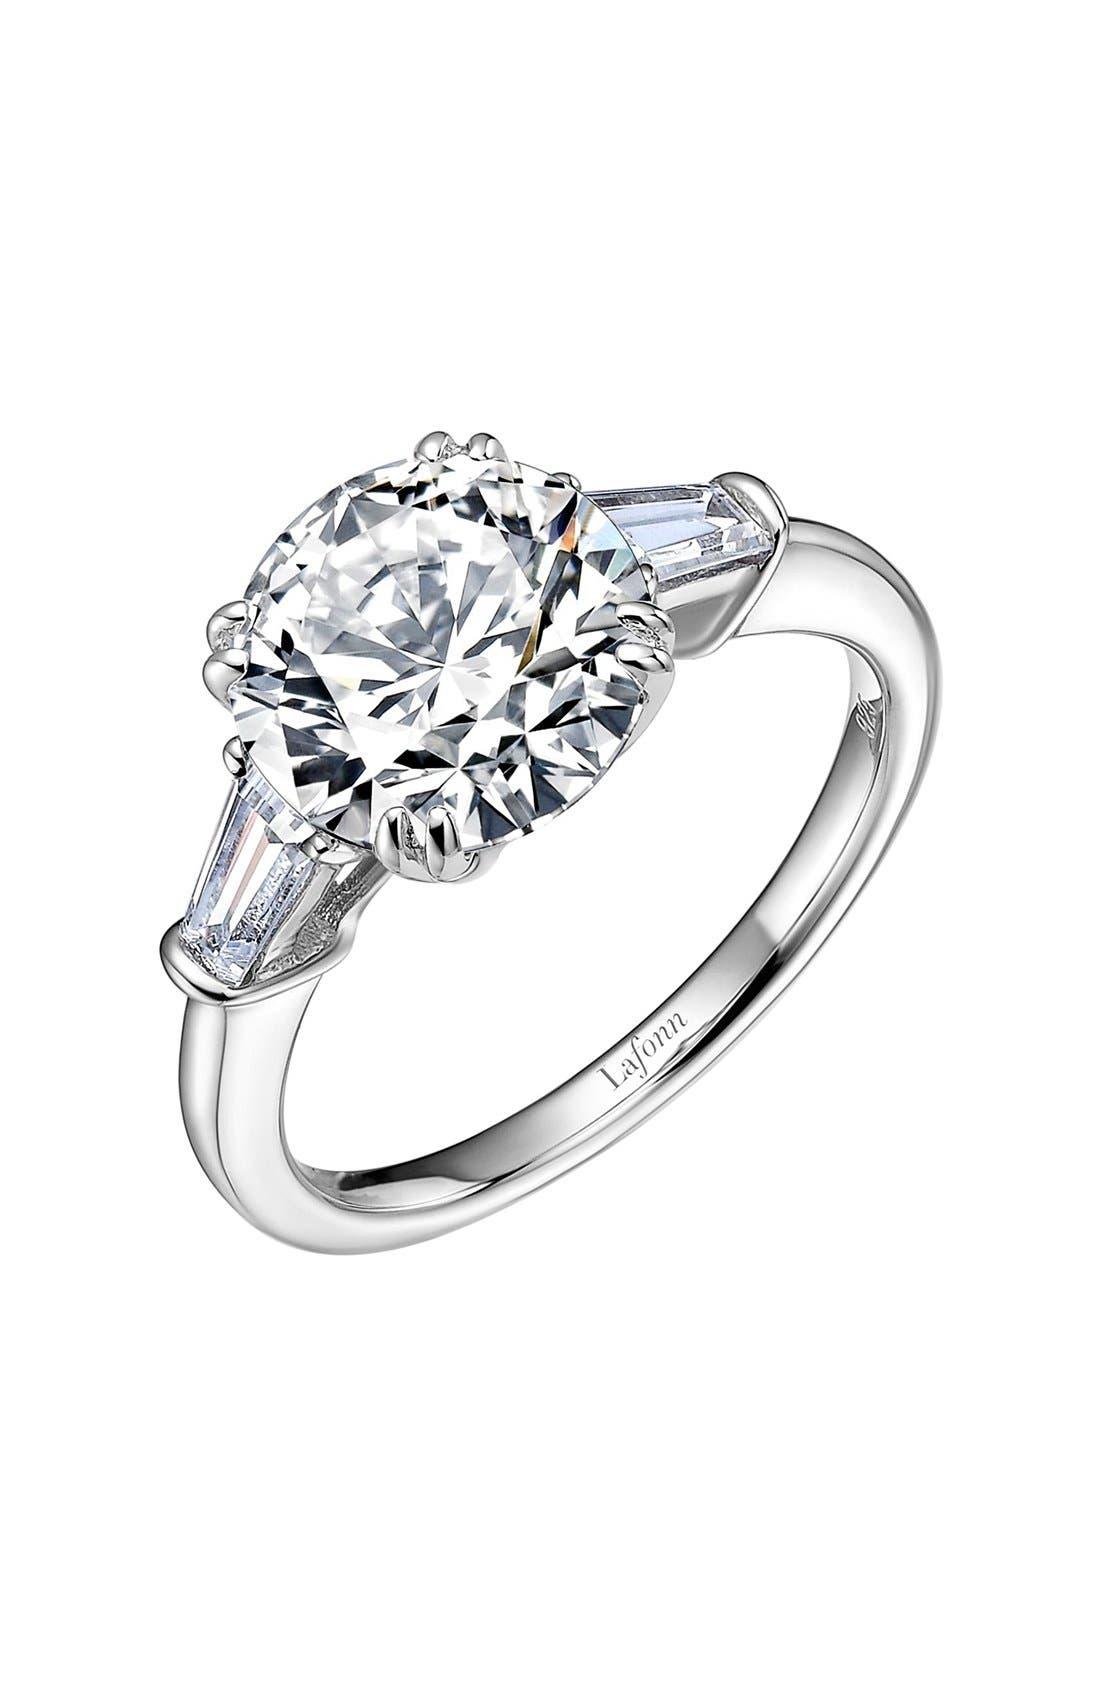 Lafonn 'Lassaire' Three Stone Ring